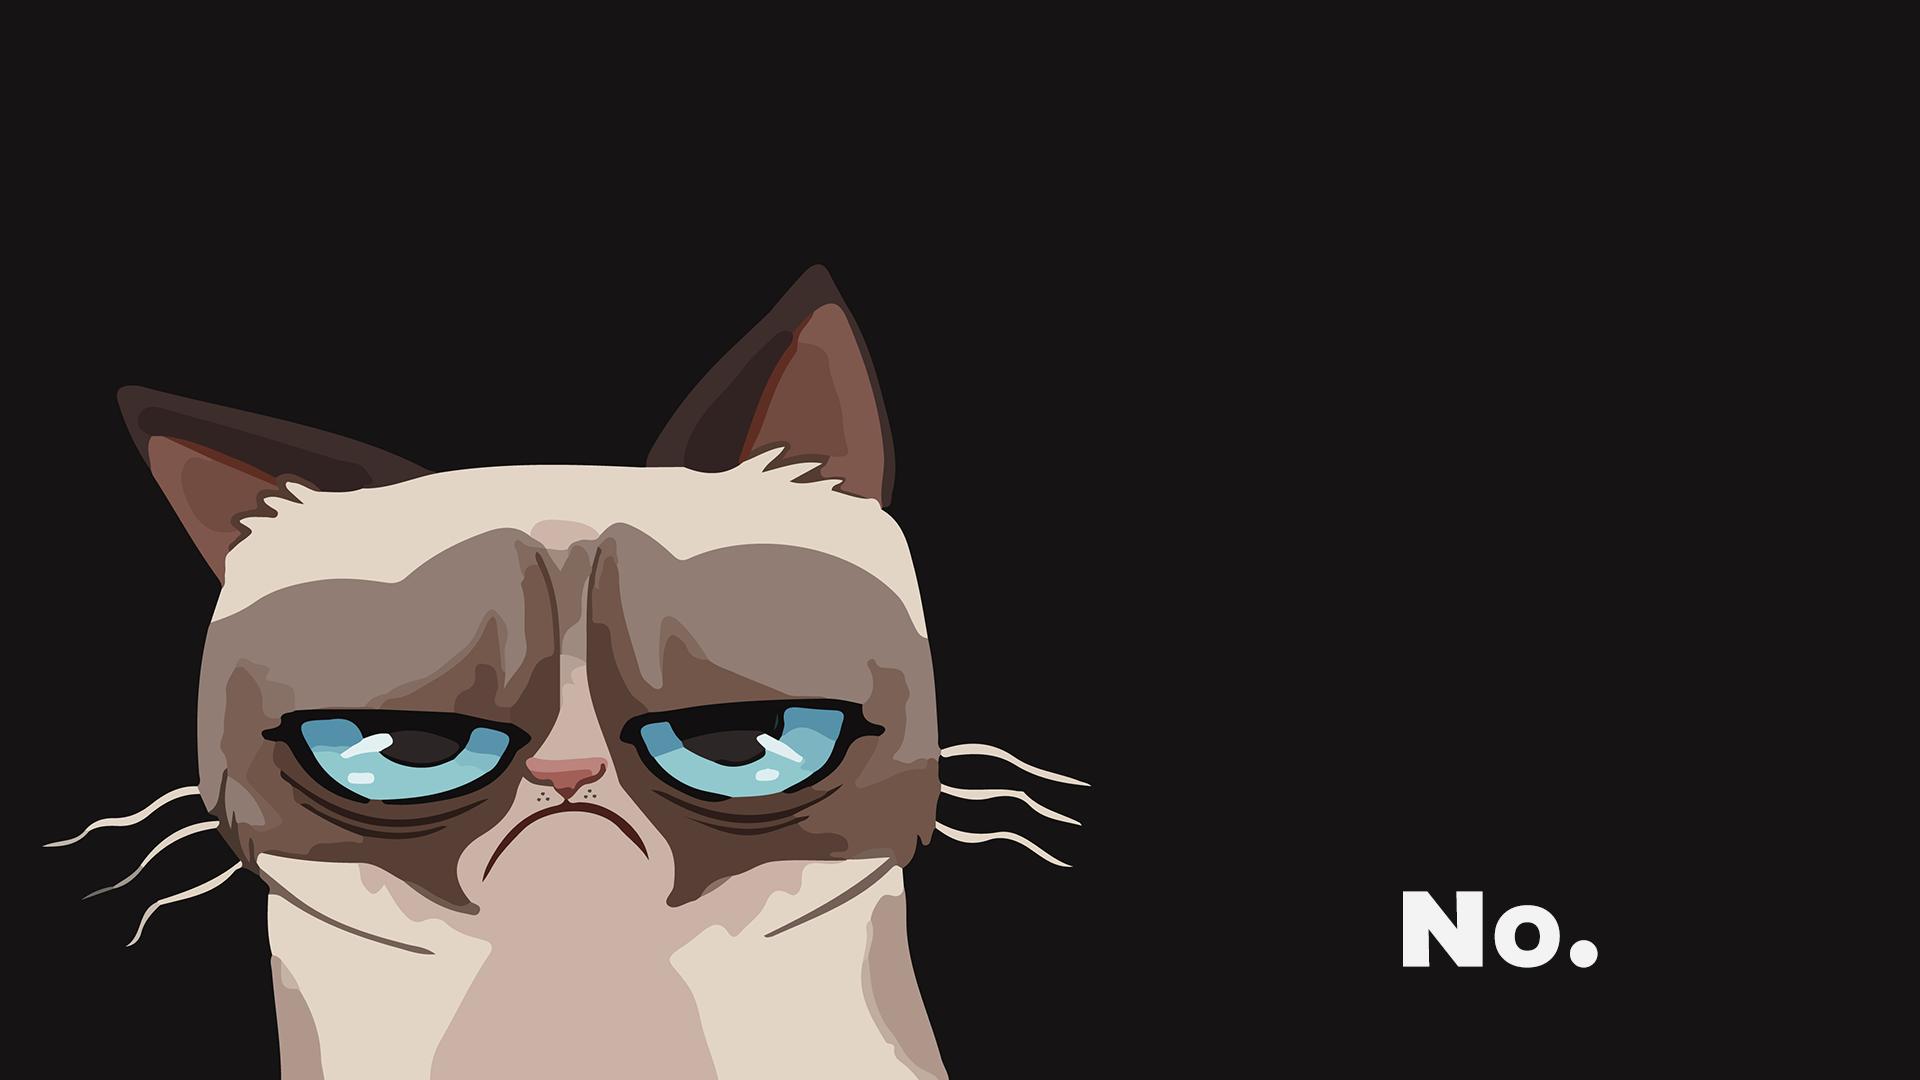 Wallpaper Grumpy Cat 1920x1080 Jniederauer 1357961 Hd